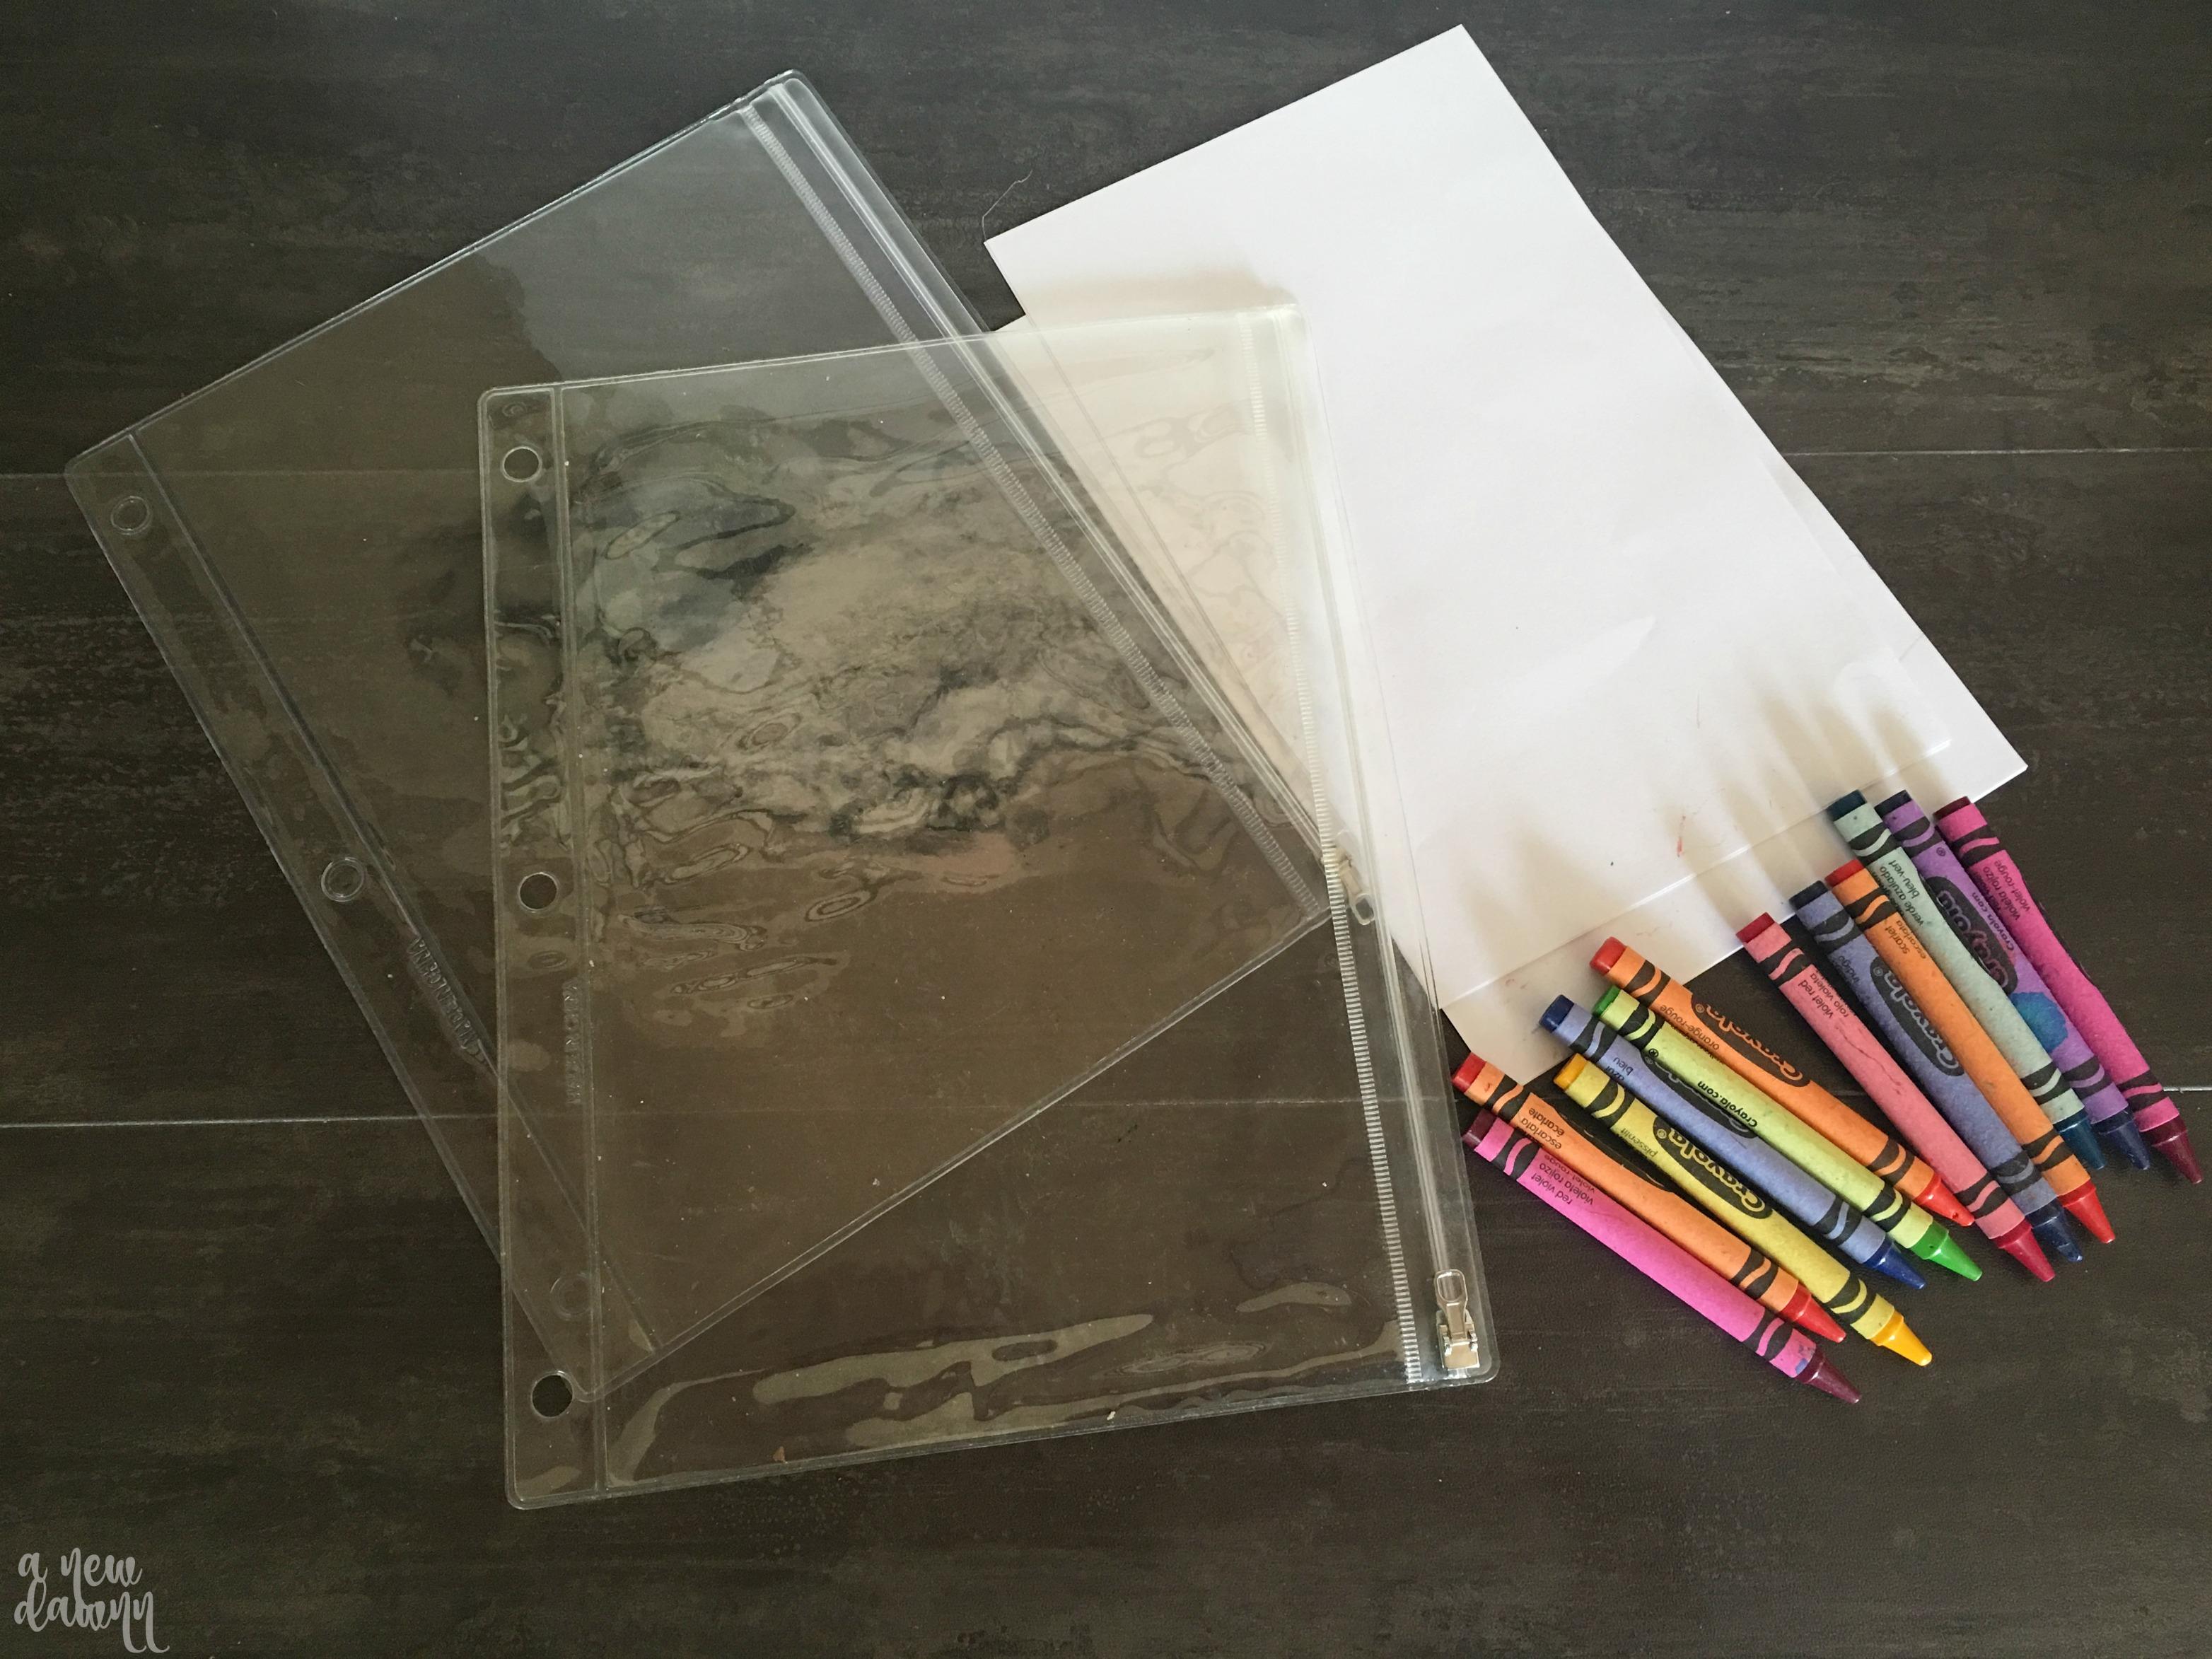 travel-art-kit-supplies